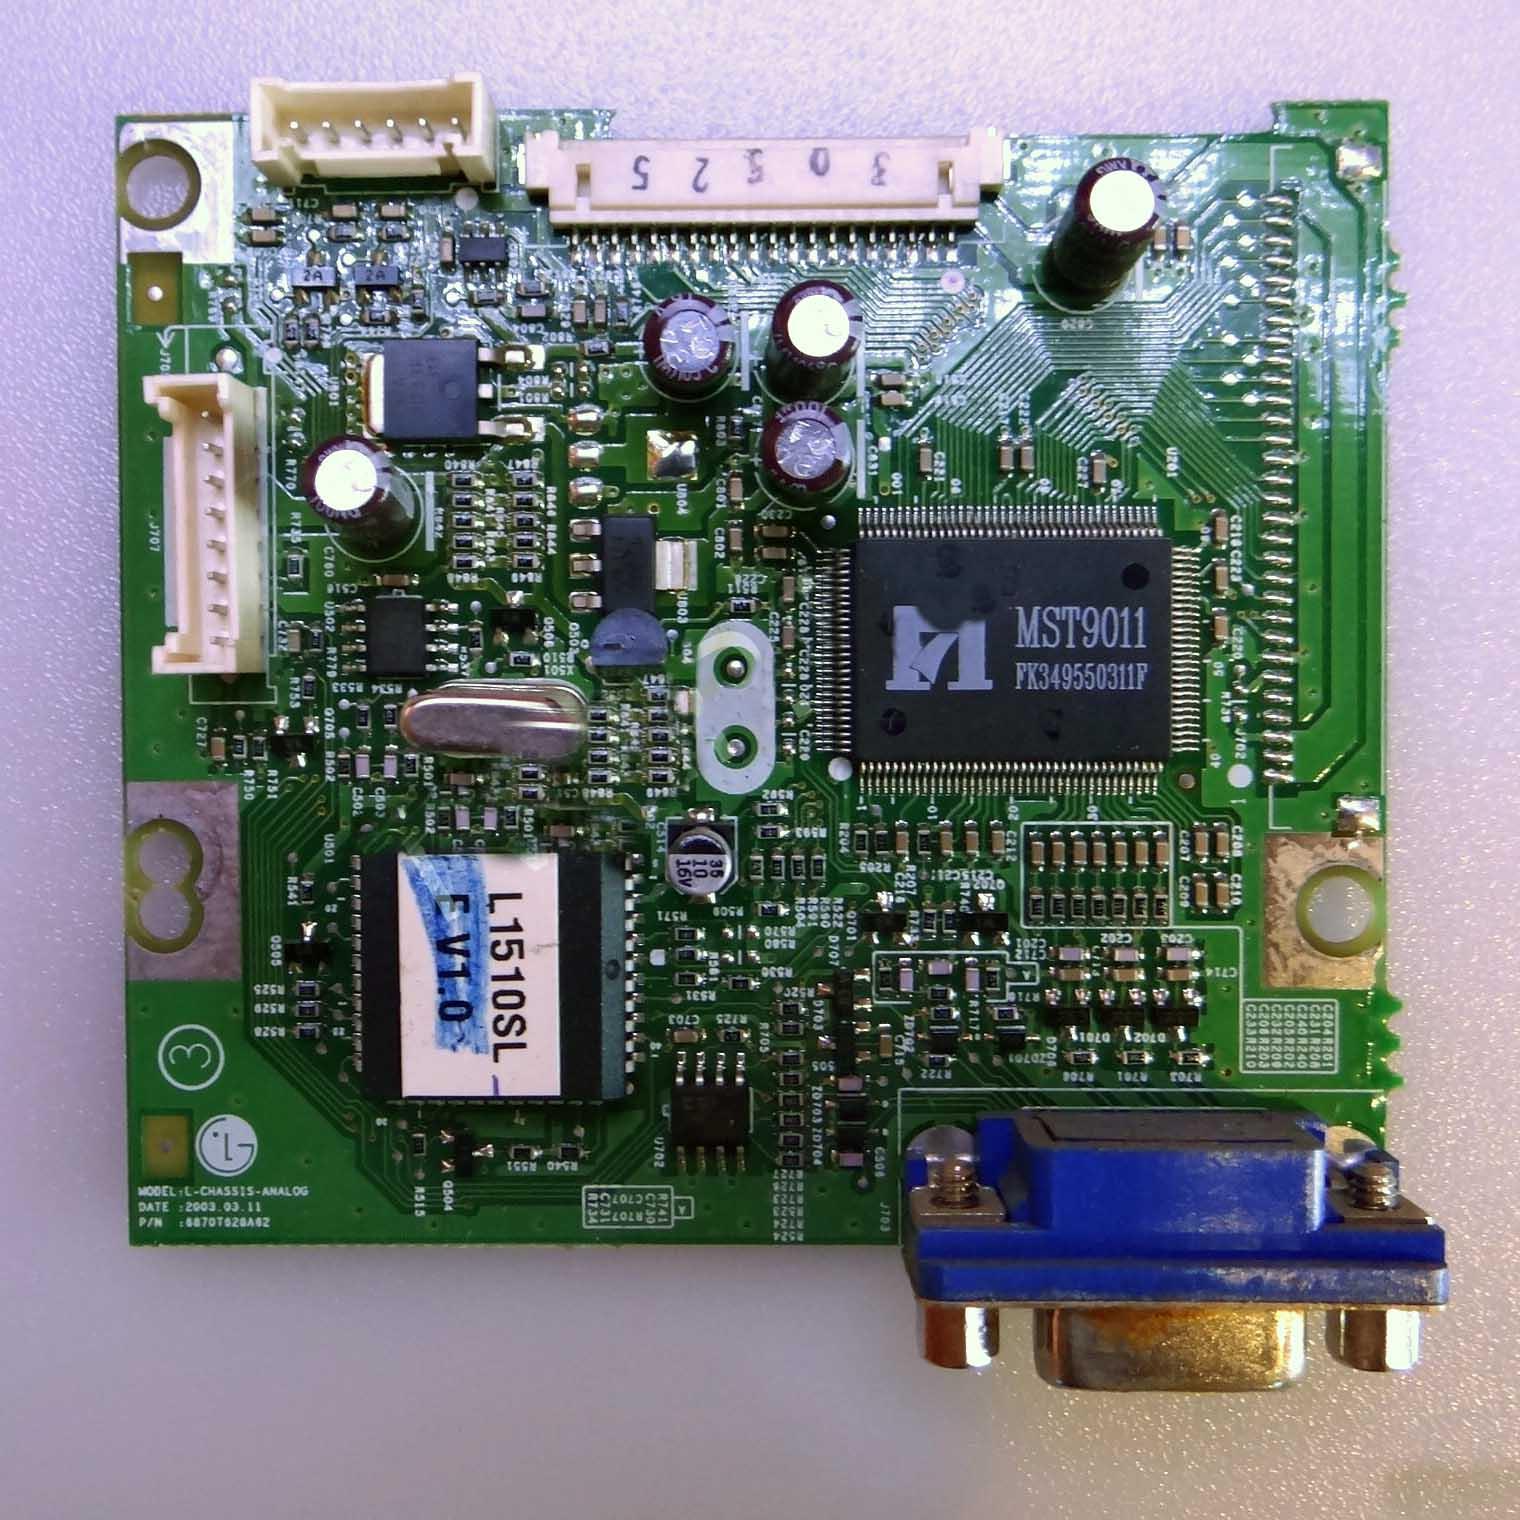 Placa Principal  Monitor LG  / Philips  PN: L-CHASSIS-ANALOG; 6870T628A62 - Retirado